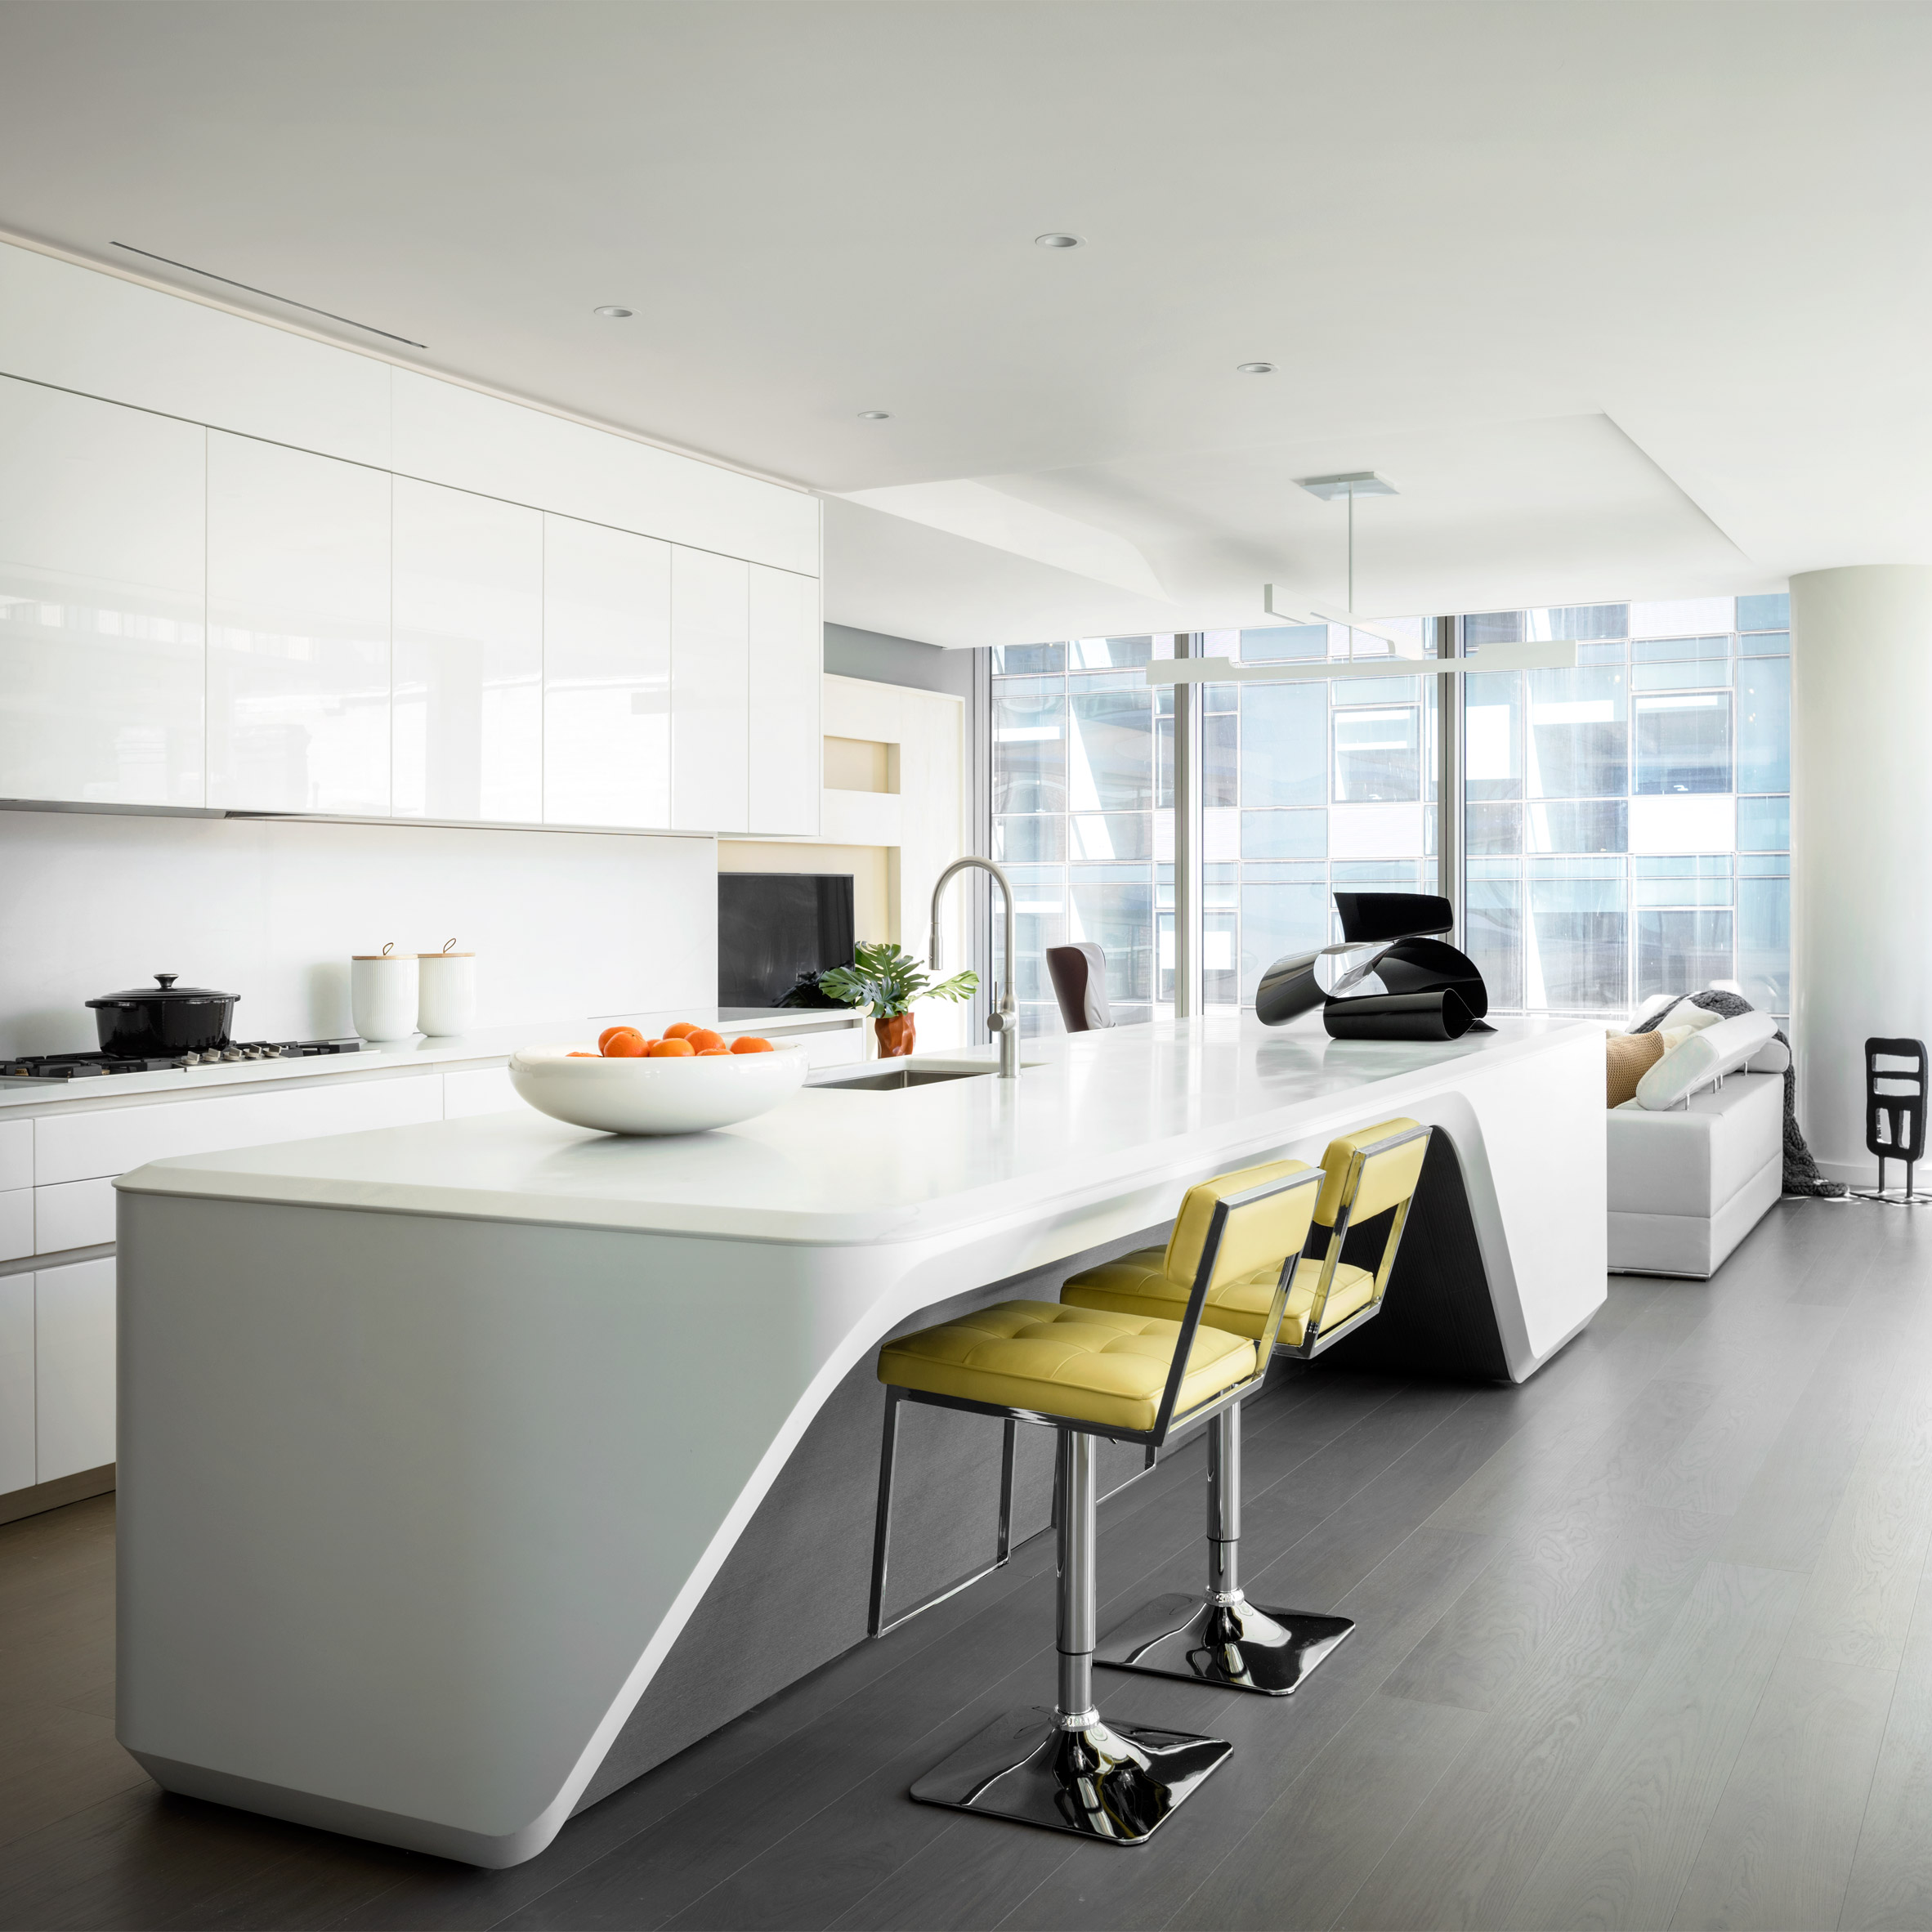 Model apartments offer a taste of life inside Zaha Hadids New